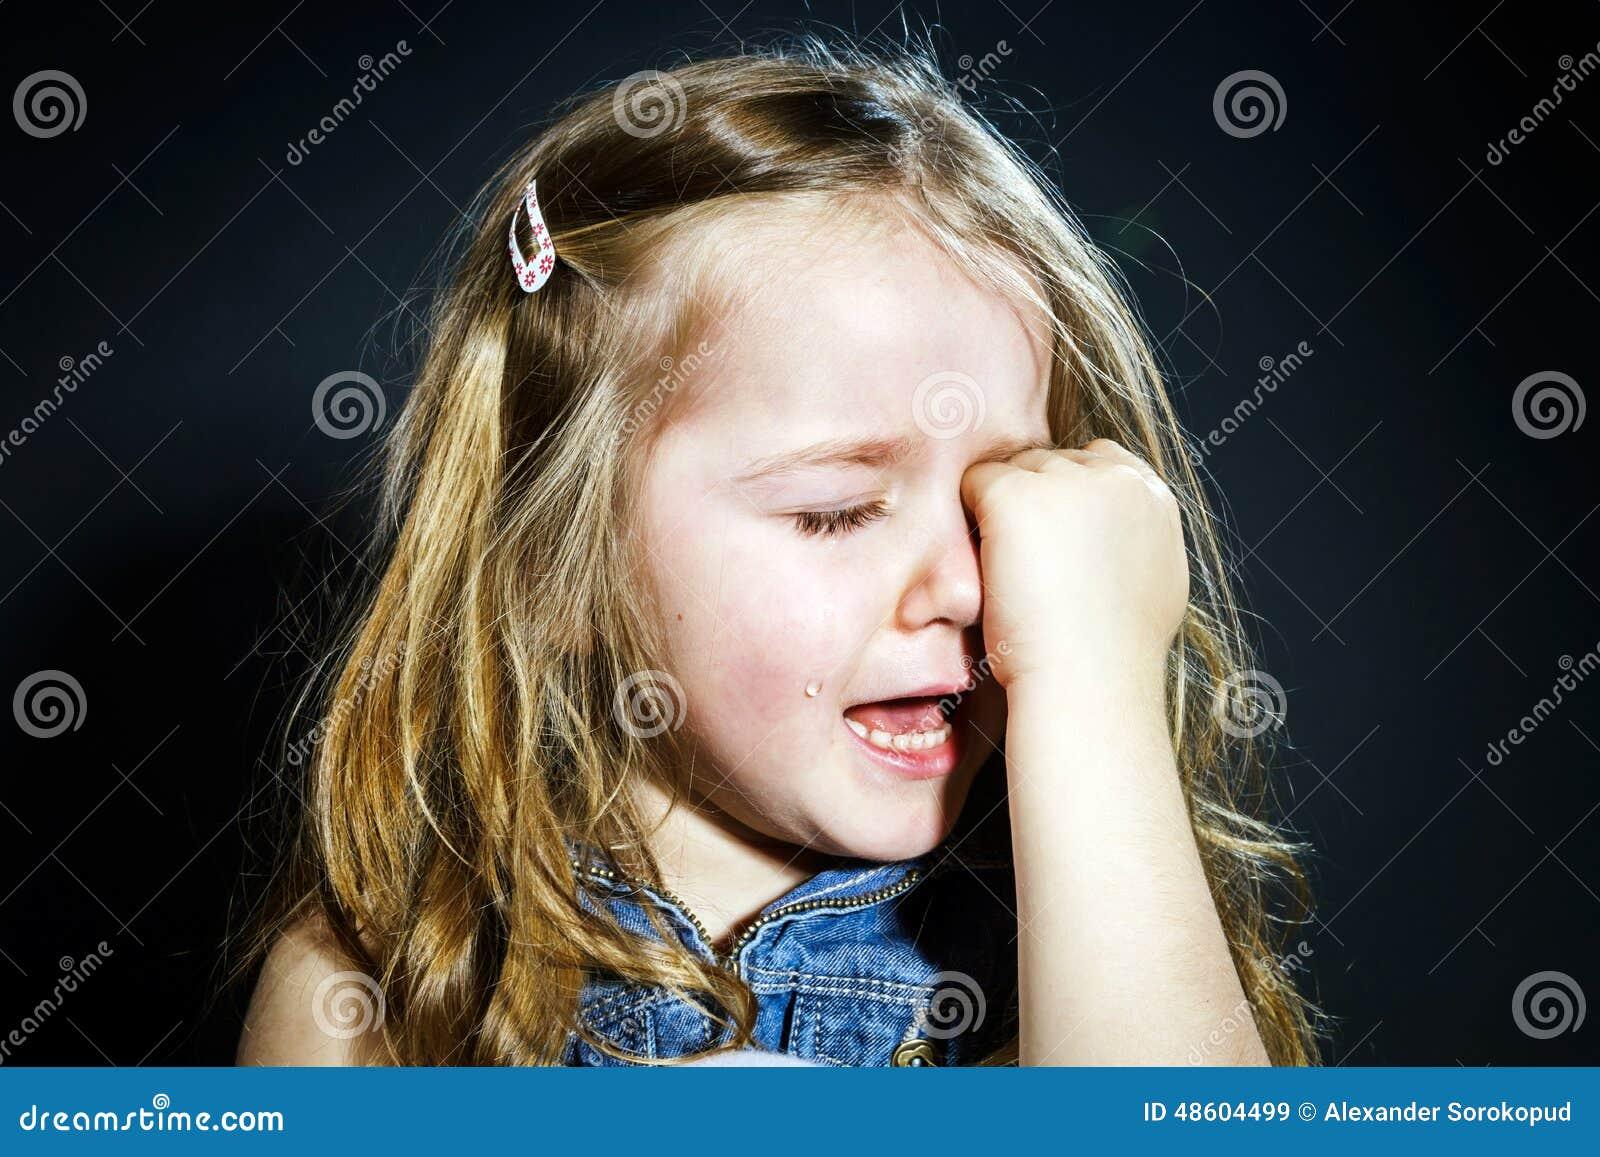 Free girls crying porn